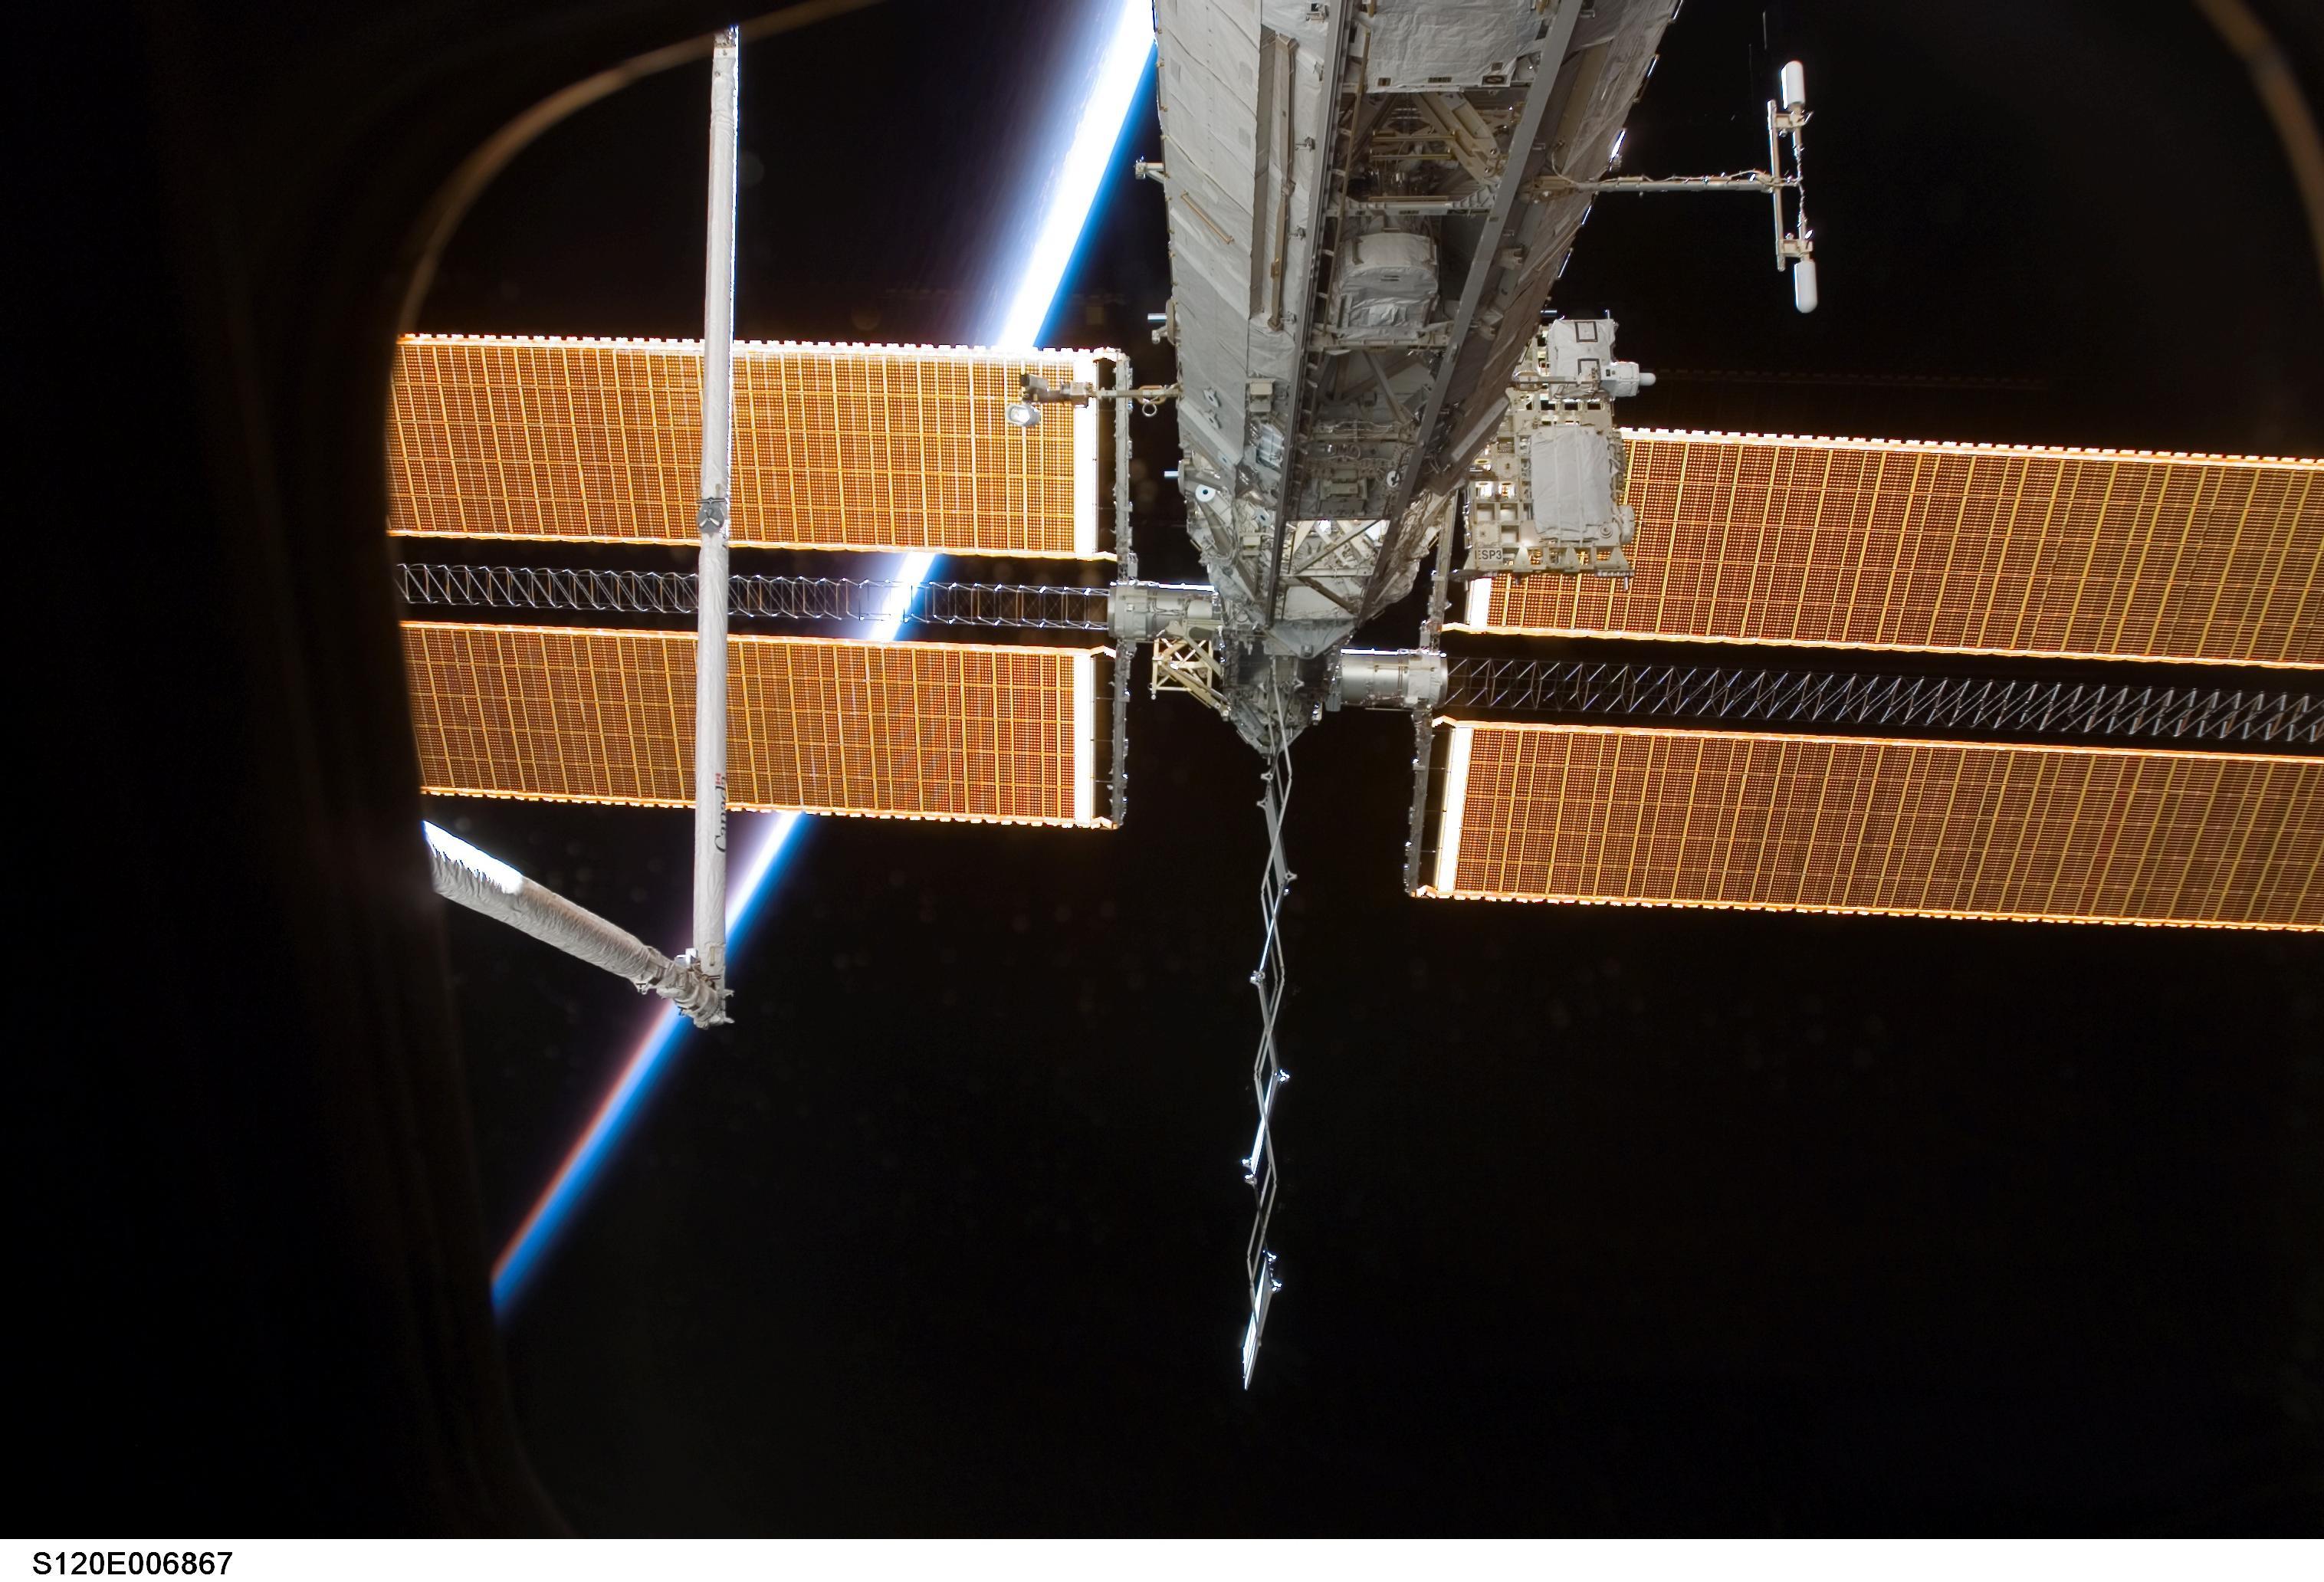 spacecraft solar array panels - photo #23